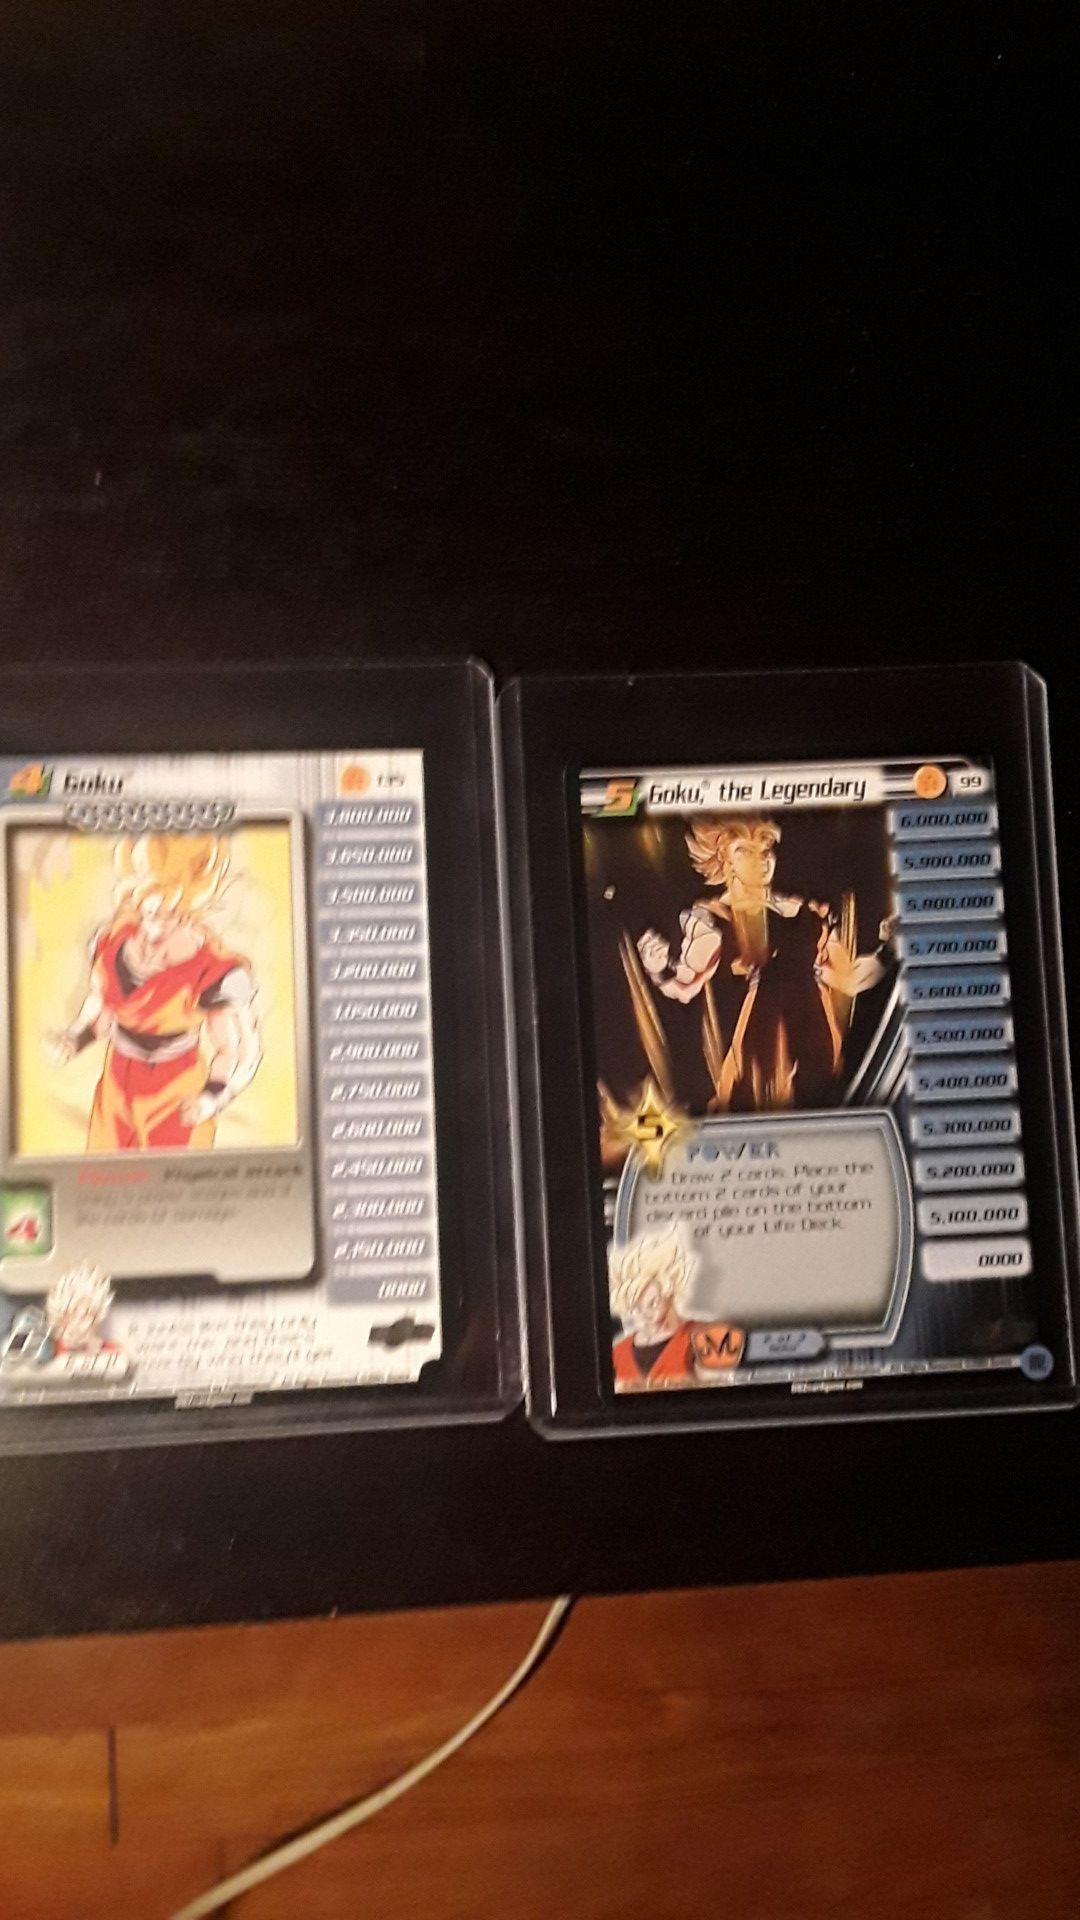 Dragon ball z character cards collectors goku lv 1-5